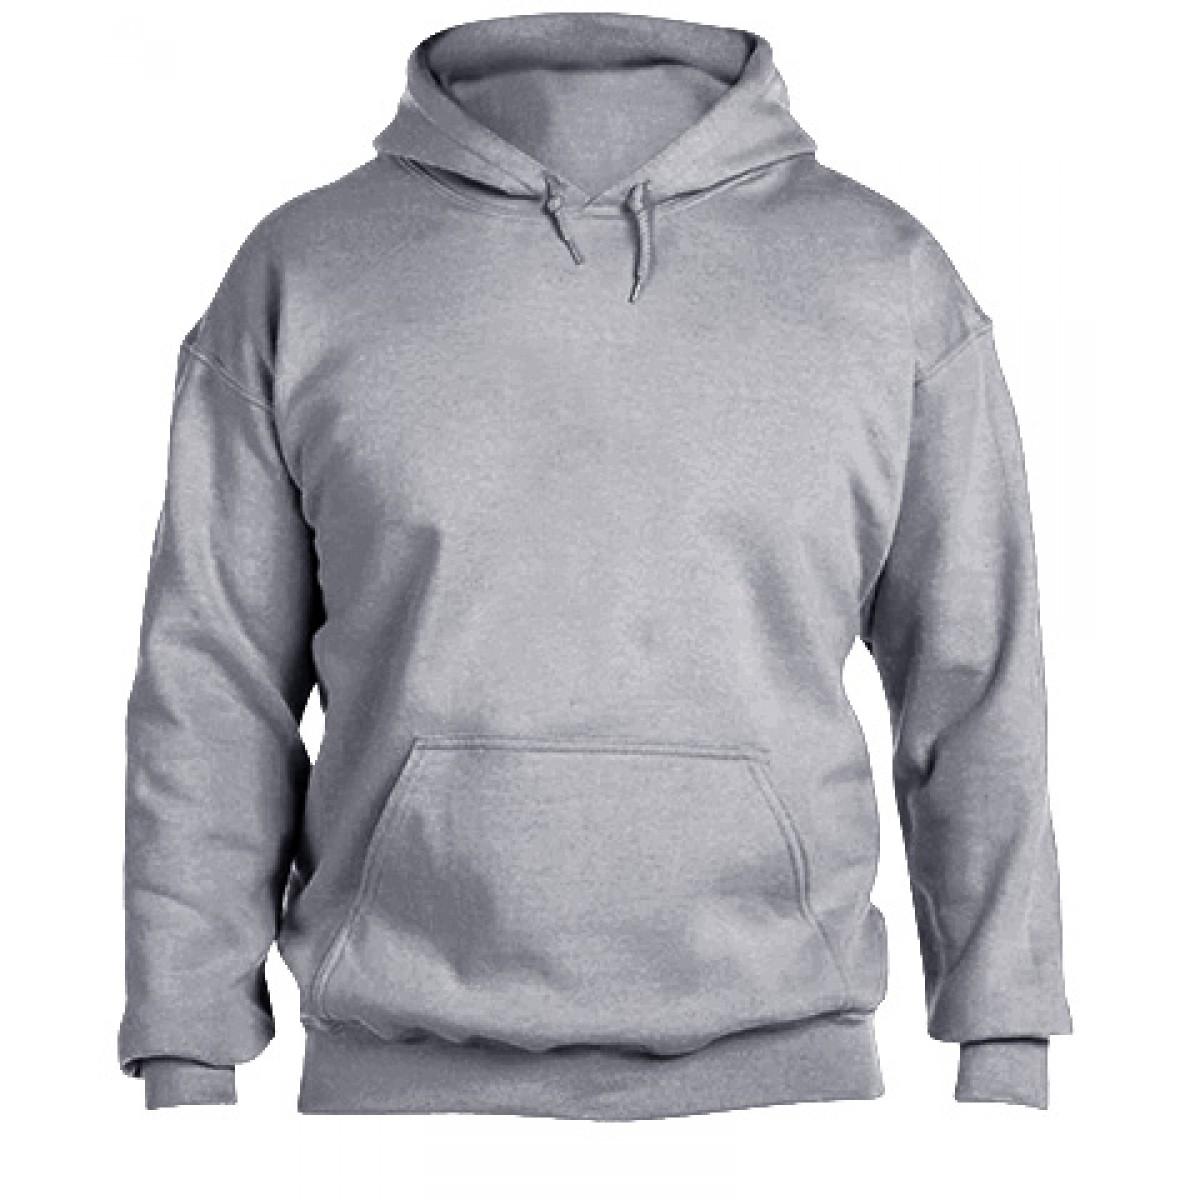 Hooded Sweatshirt 50/50 Heavy Blend-Sports Grey-YL